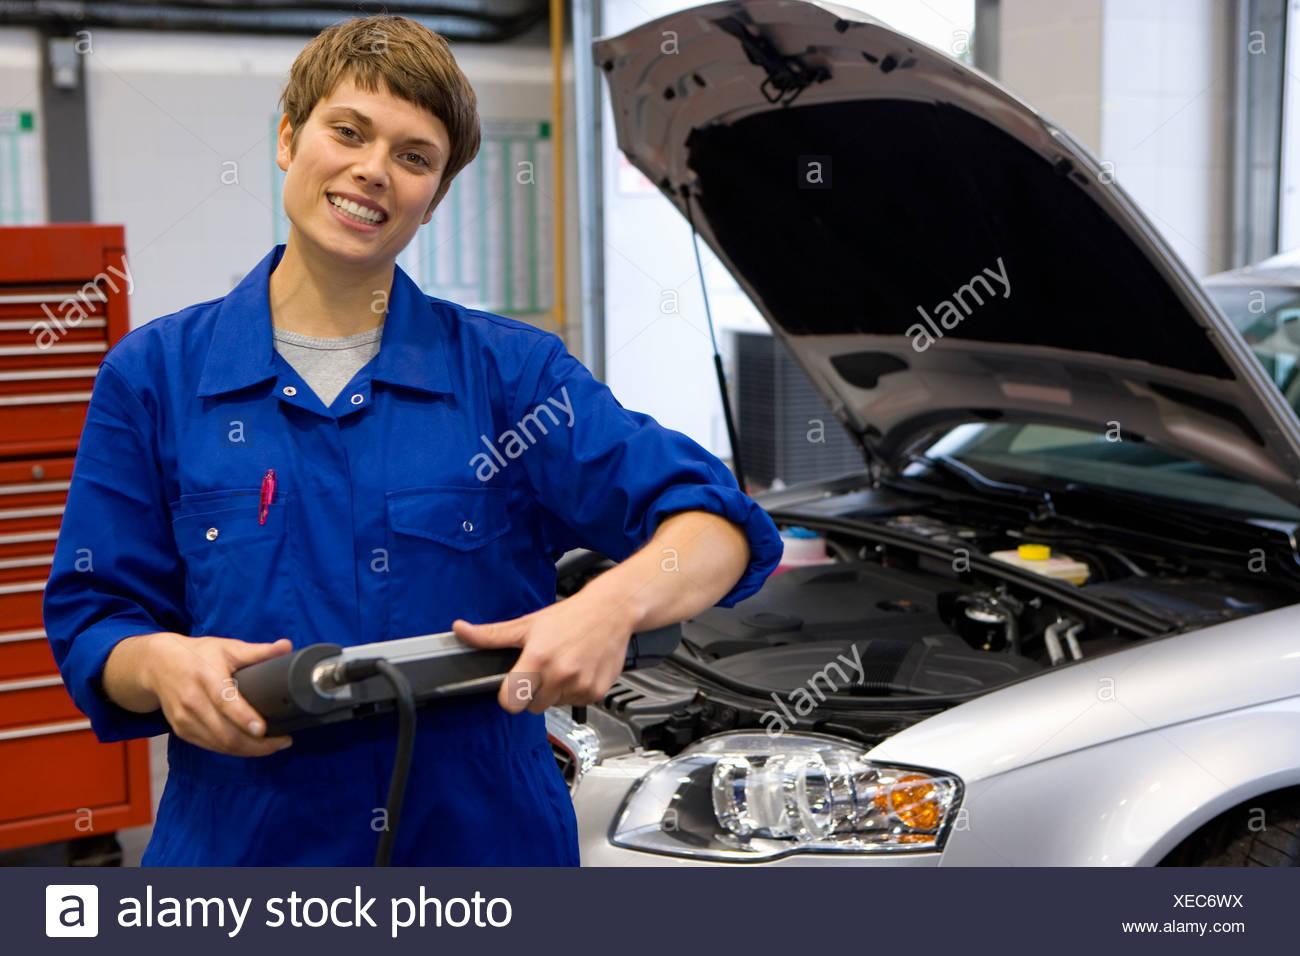 Female mechanic with electronic diagnostics device, portrait - Stock Image